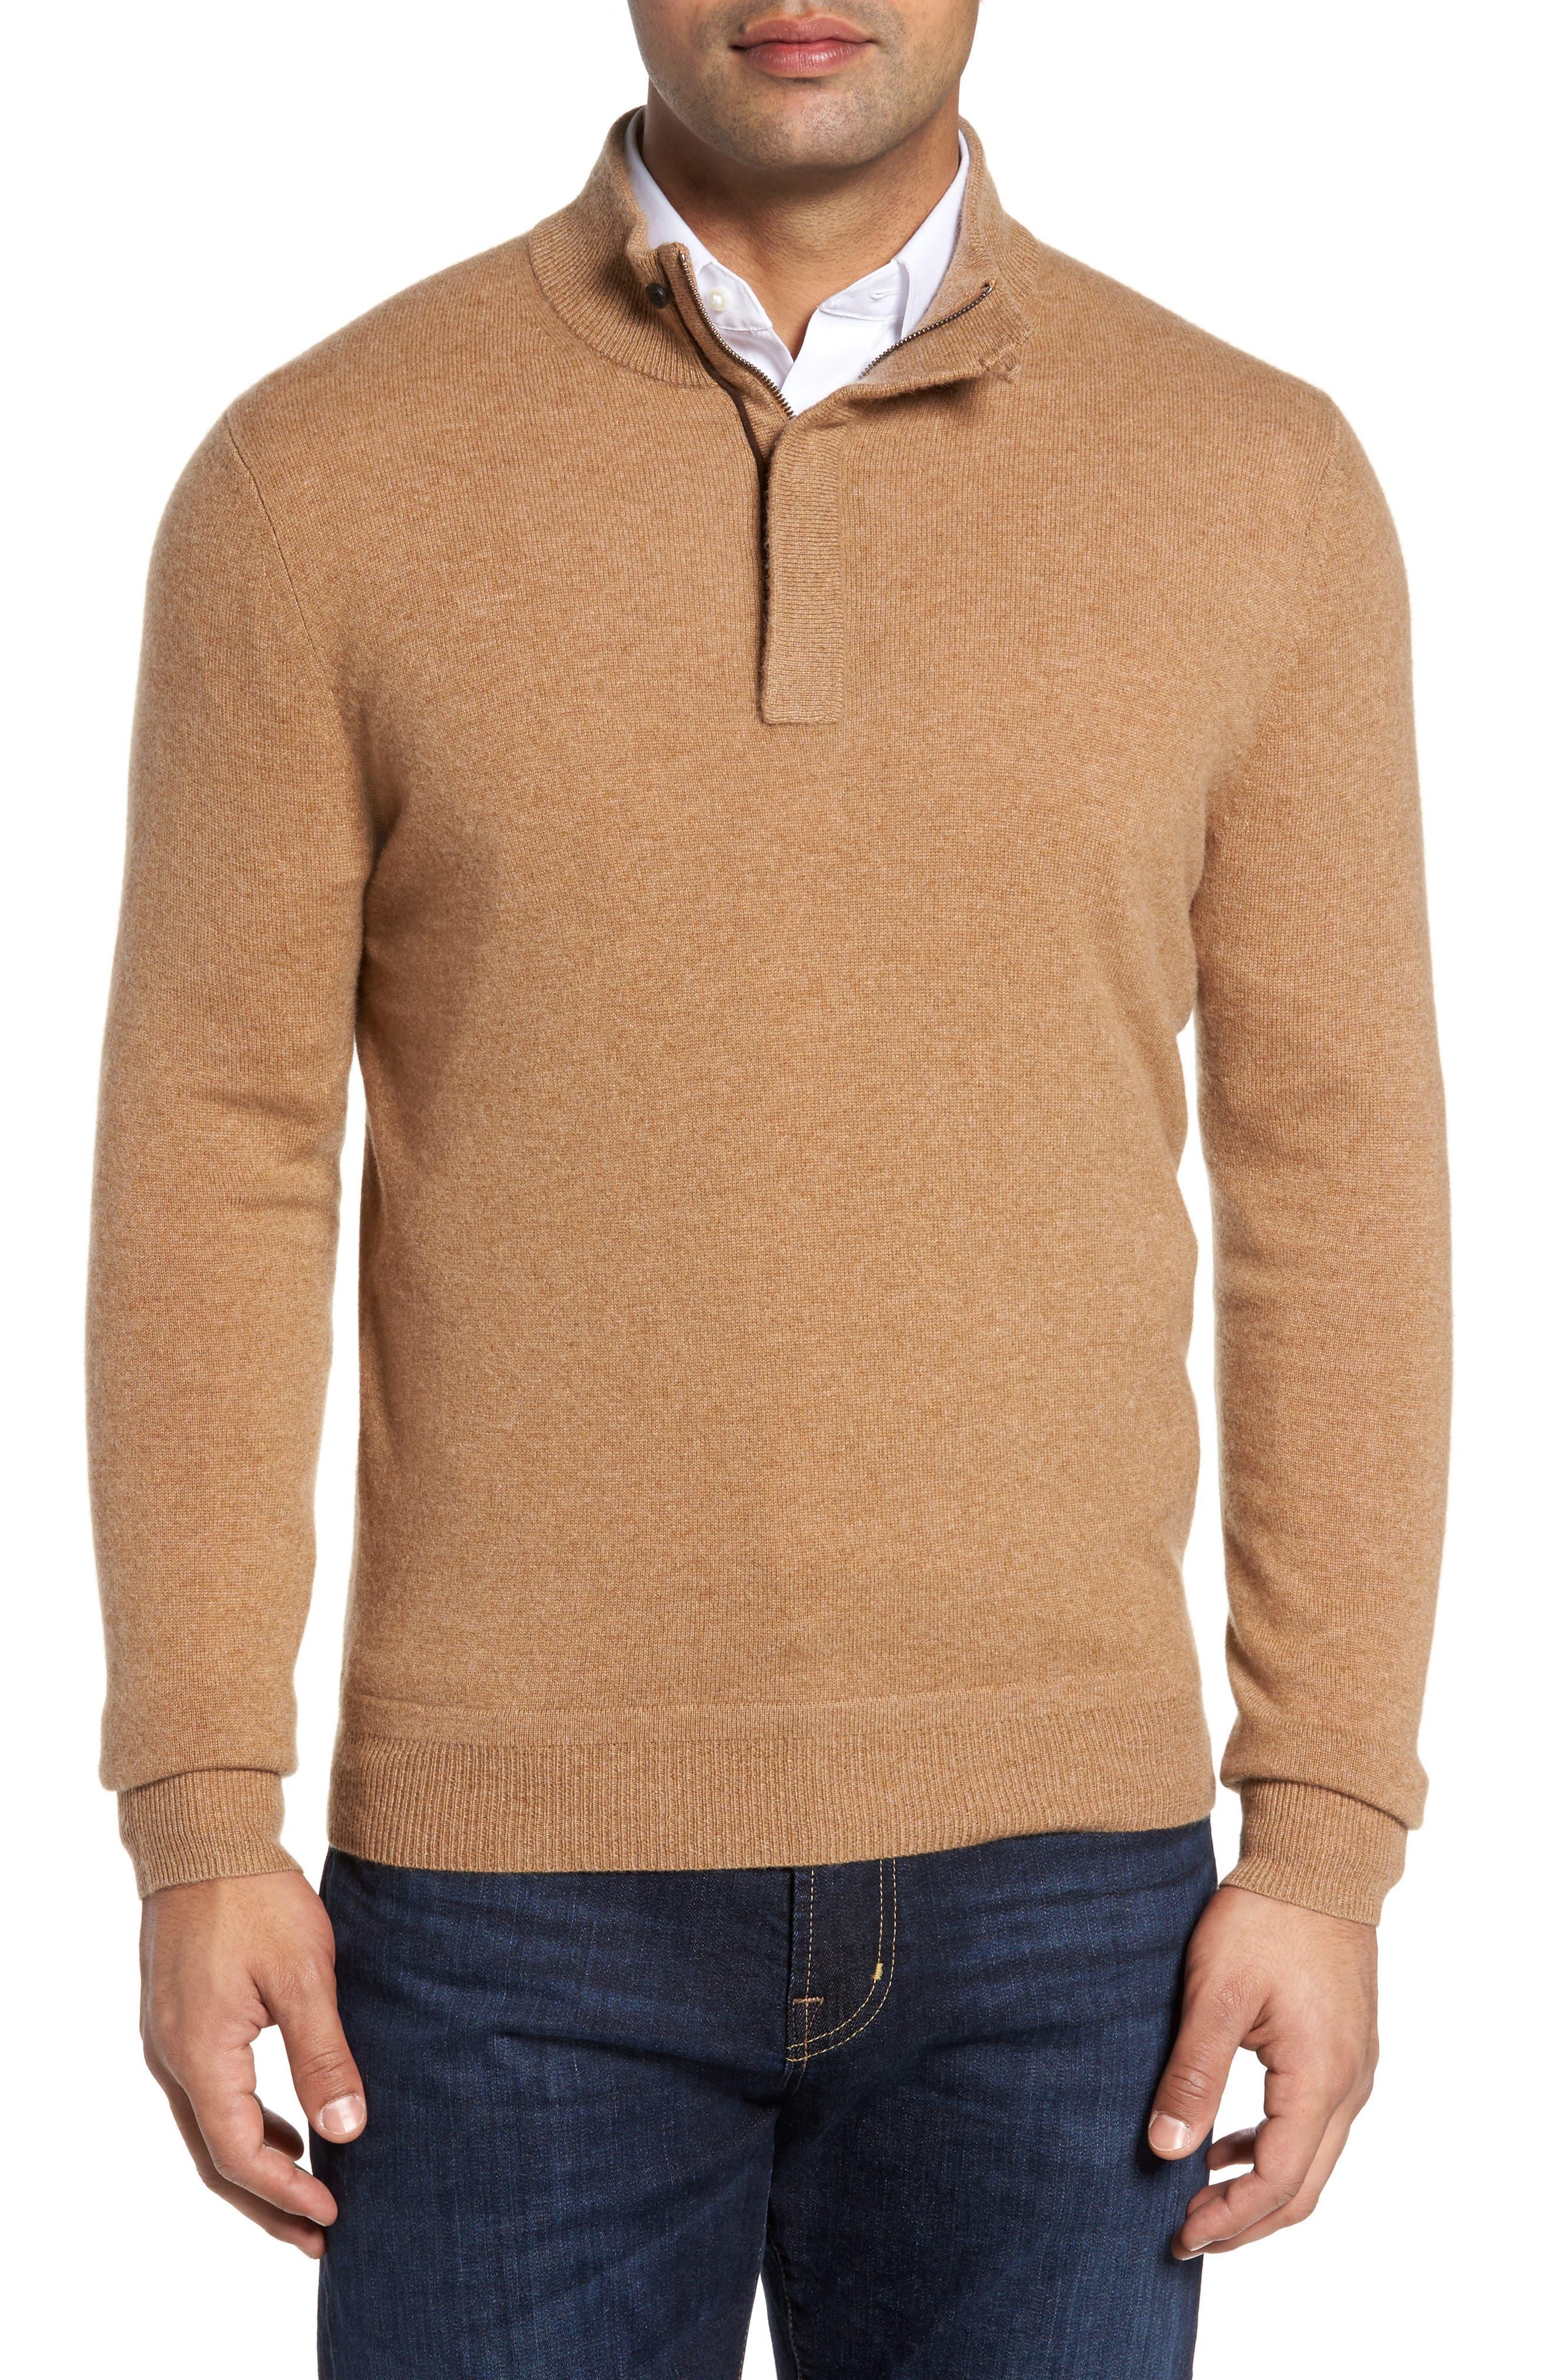 Cashmere Quarter Zip Sweater,                             Main thumbnail 1, color,                             Brown Bear